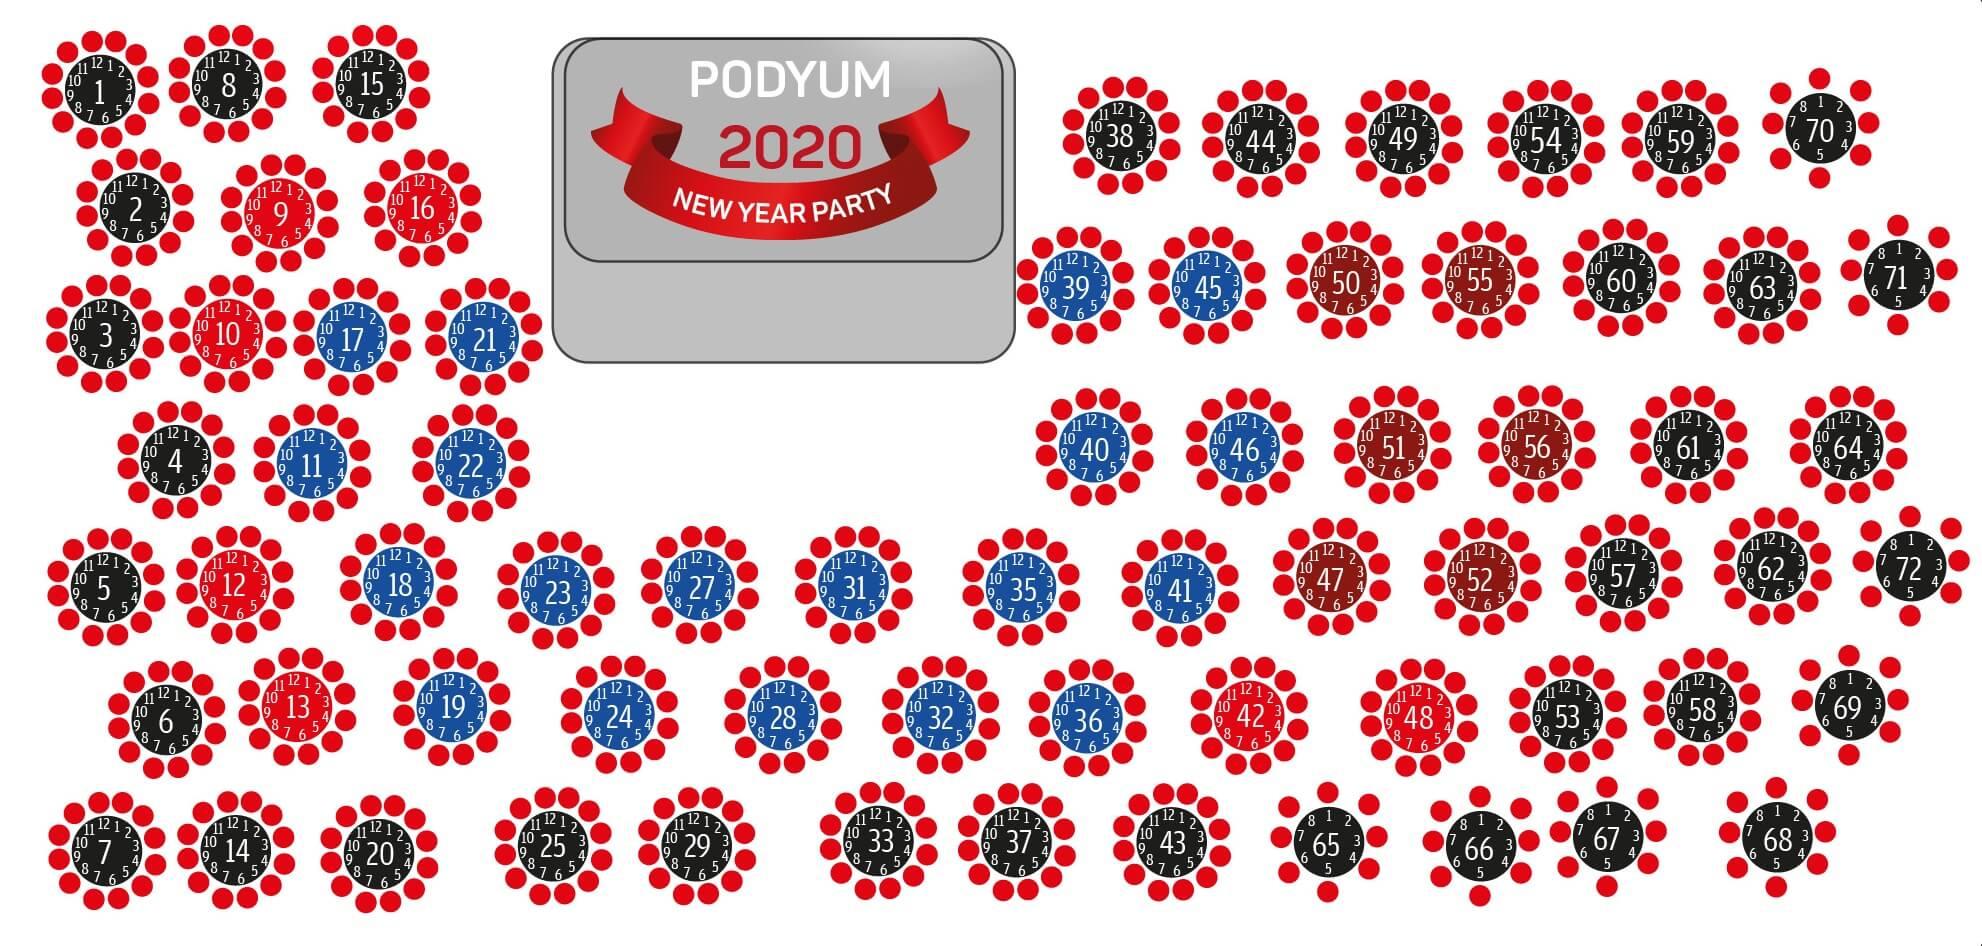 Ramada Plaza Antalya Yılbaşı Programı 2020